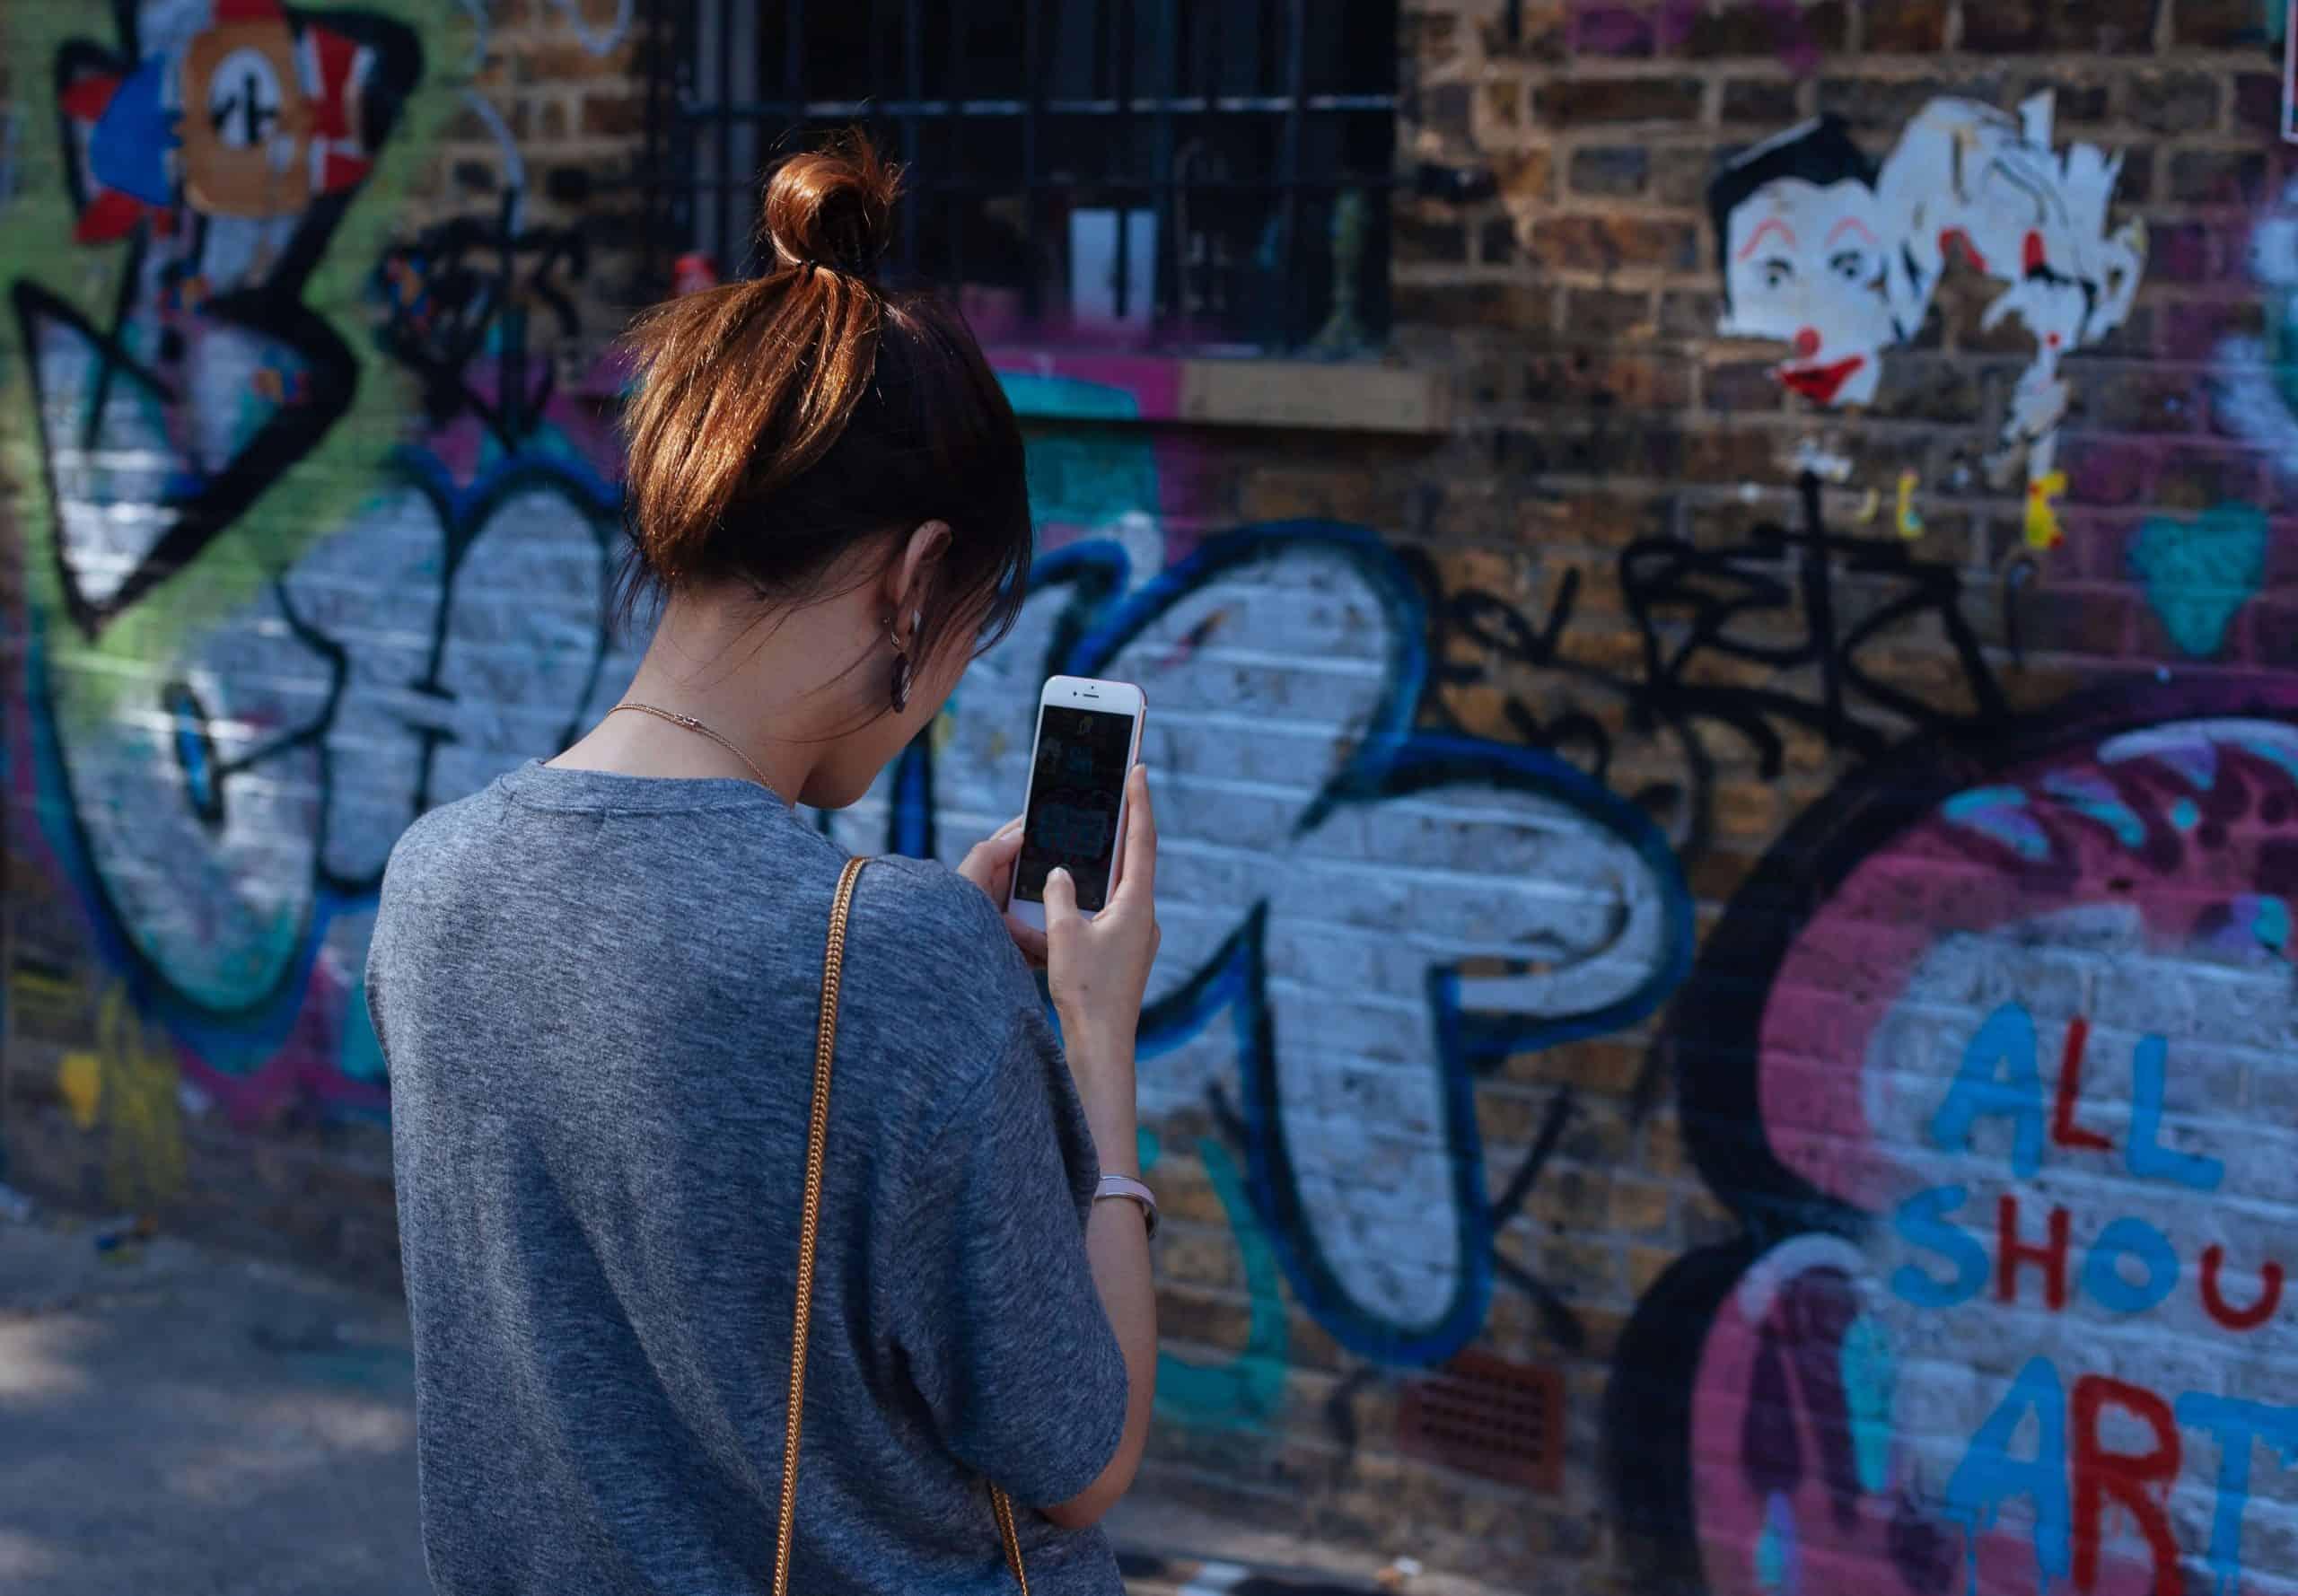 frases-curtas-status-redes-sociais